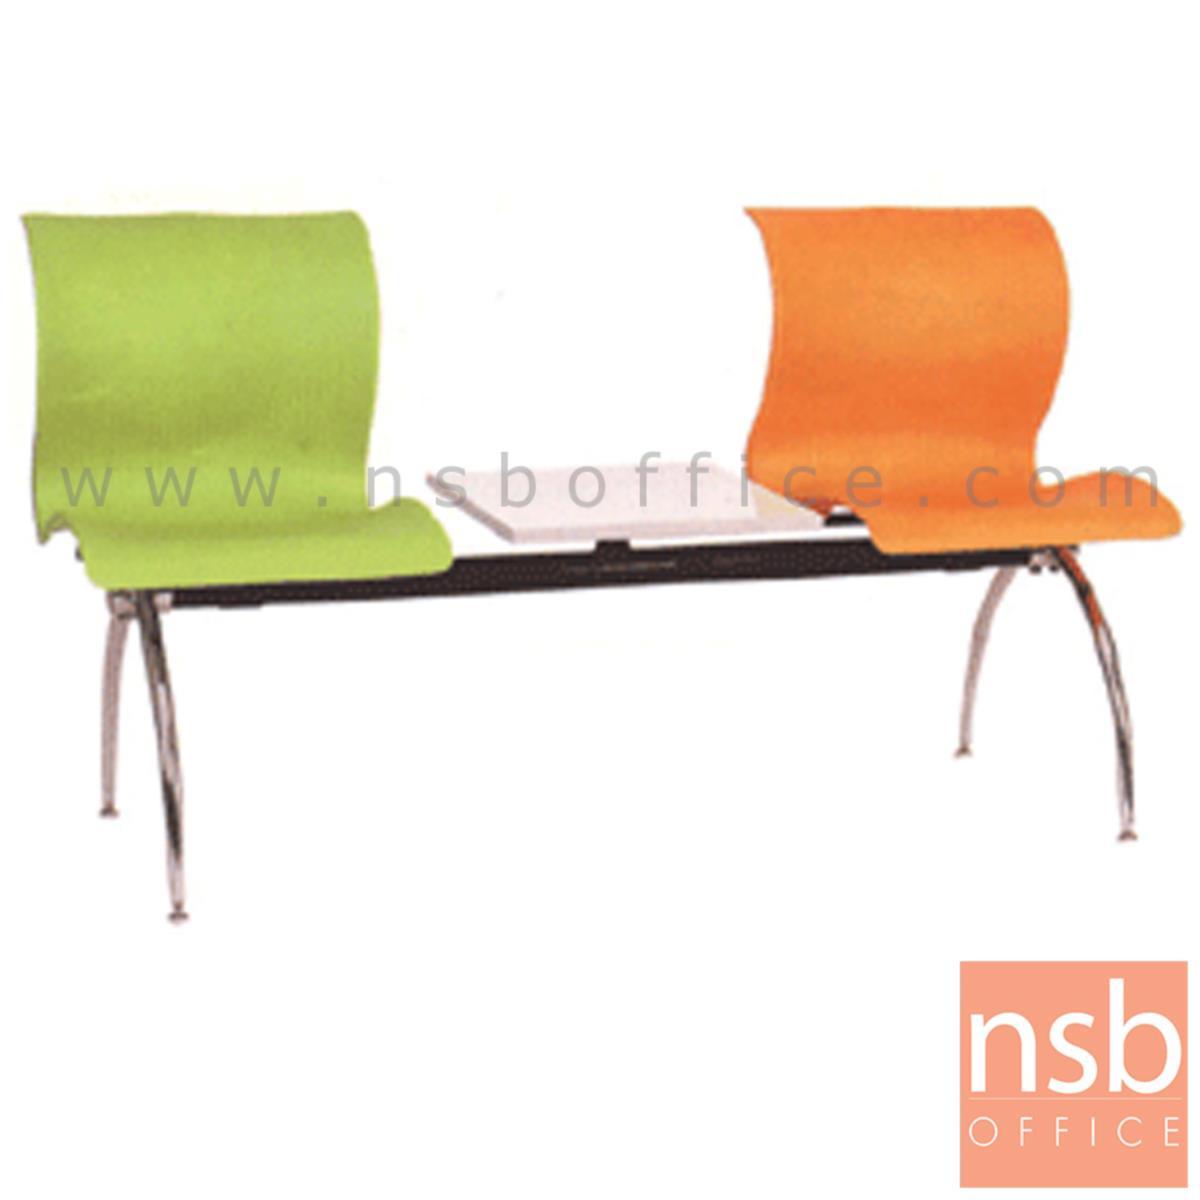 B06A044:เก้าอี้นั่งคอยเฟรมโพลี่ตัวเอส รุ่น B901 2 ,3 ที่นั่ง ขนาด 146W ,200W cm. พร้อมที่วางของ ขาเหล็ก